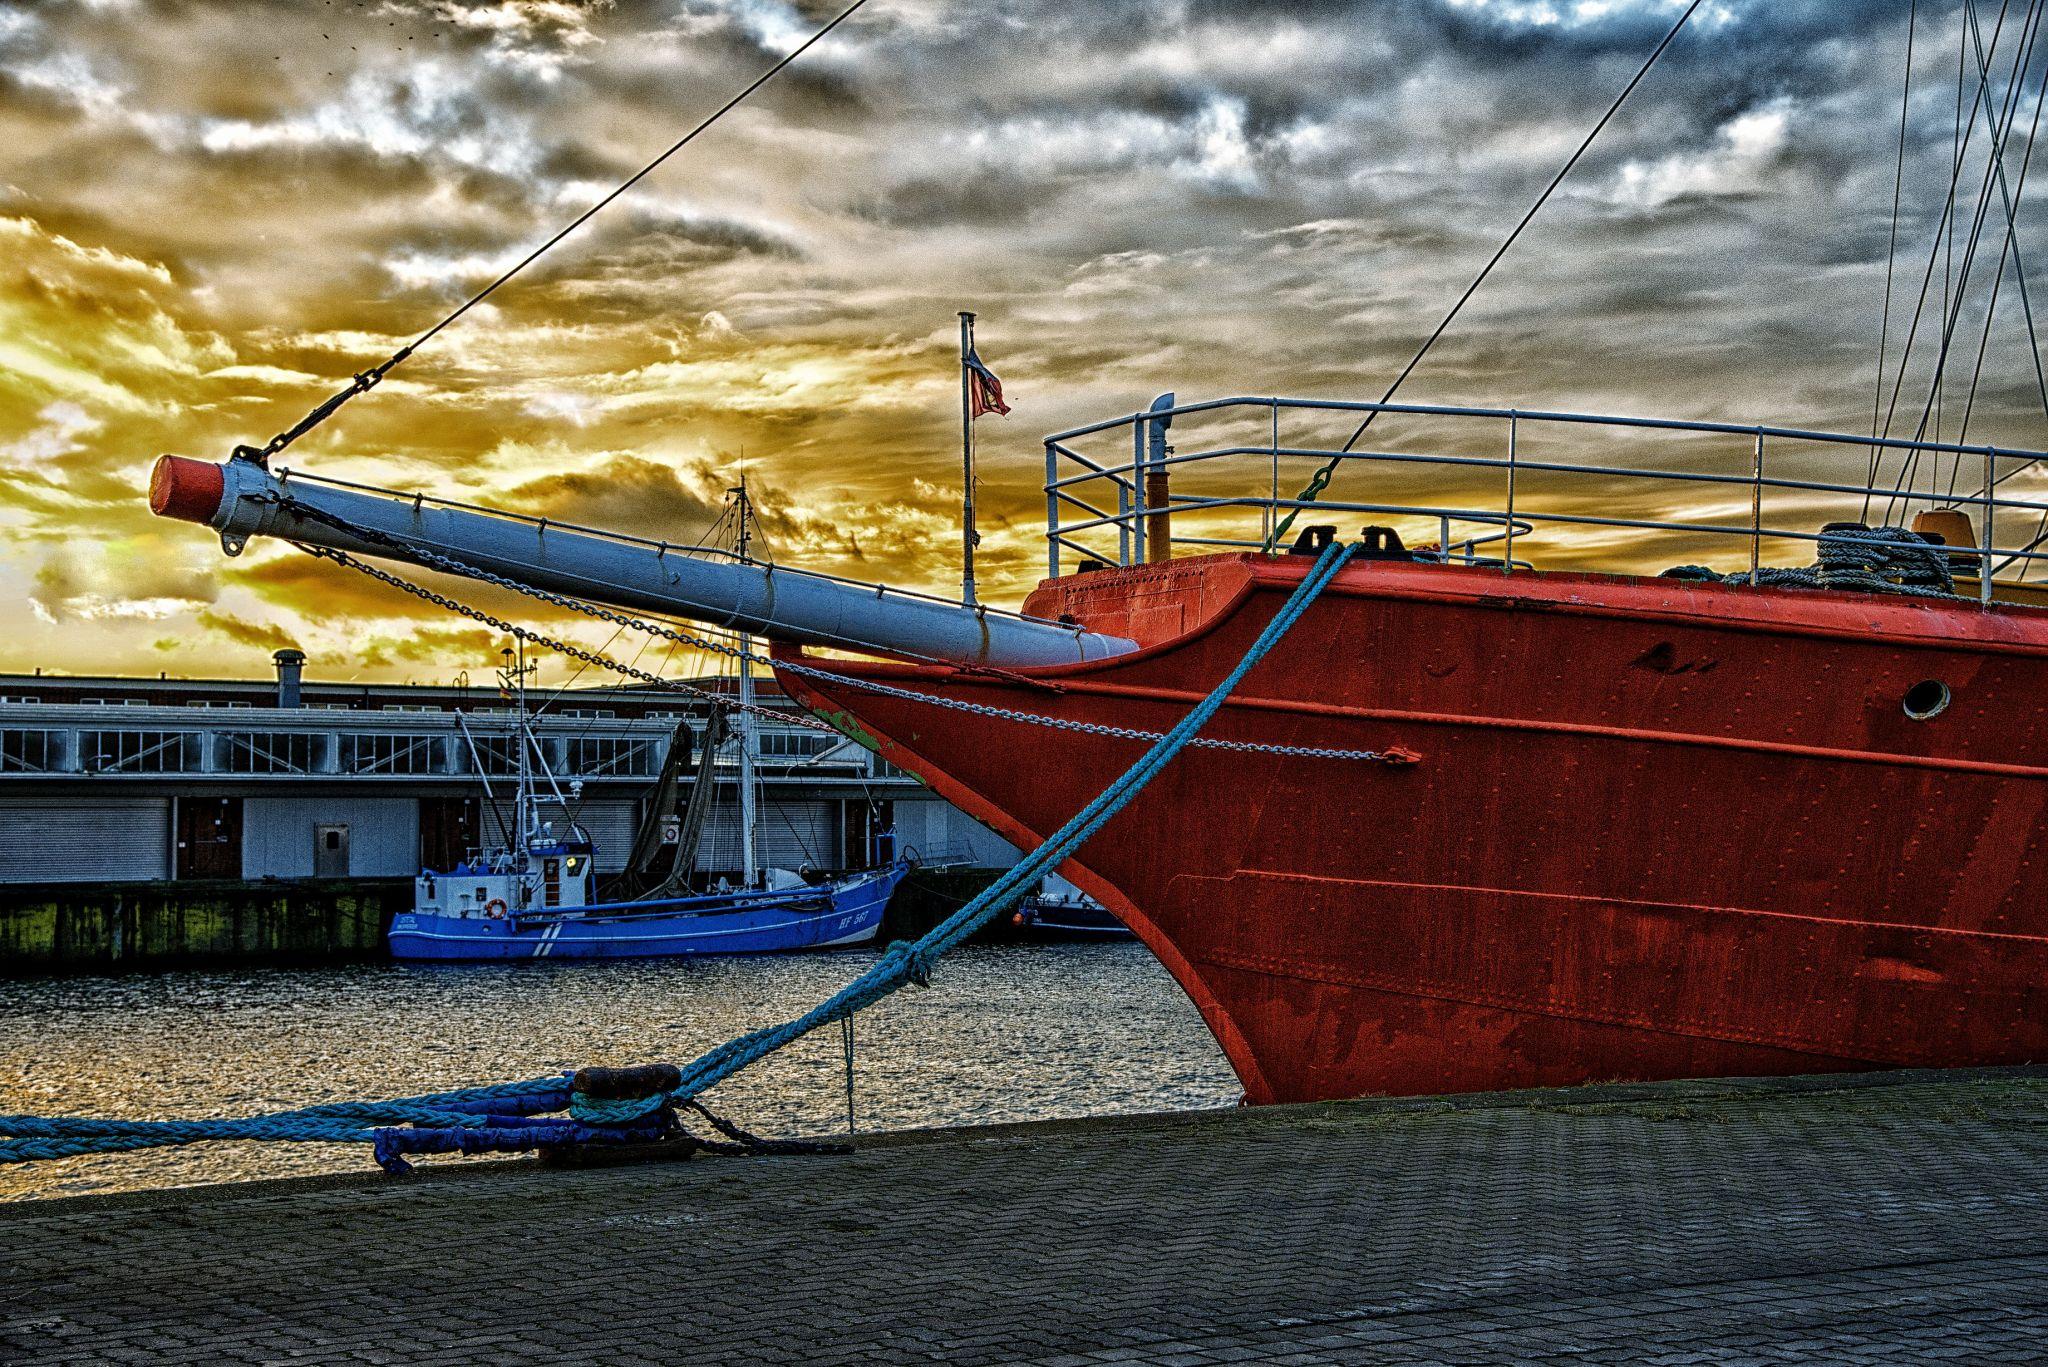 Feuerschiff Elbe 1 - light ship, Germany